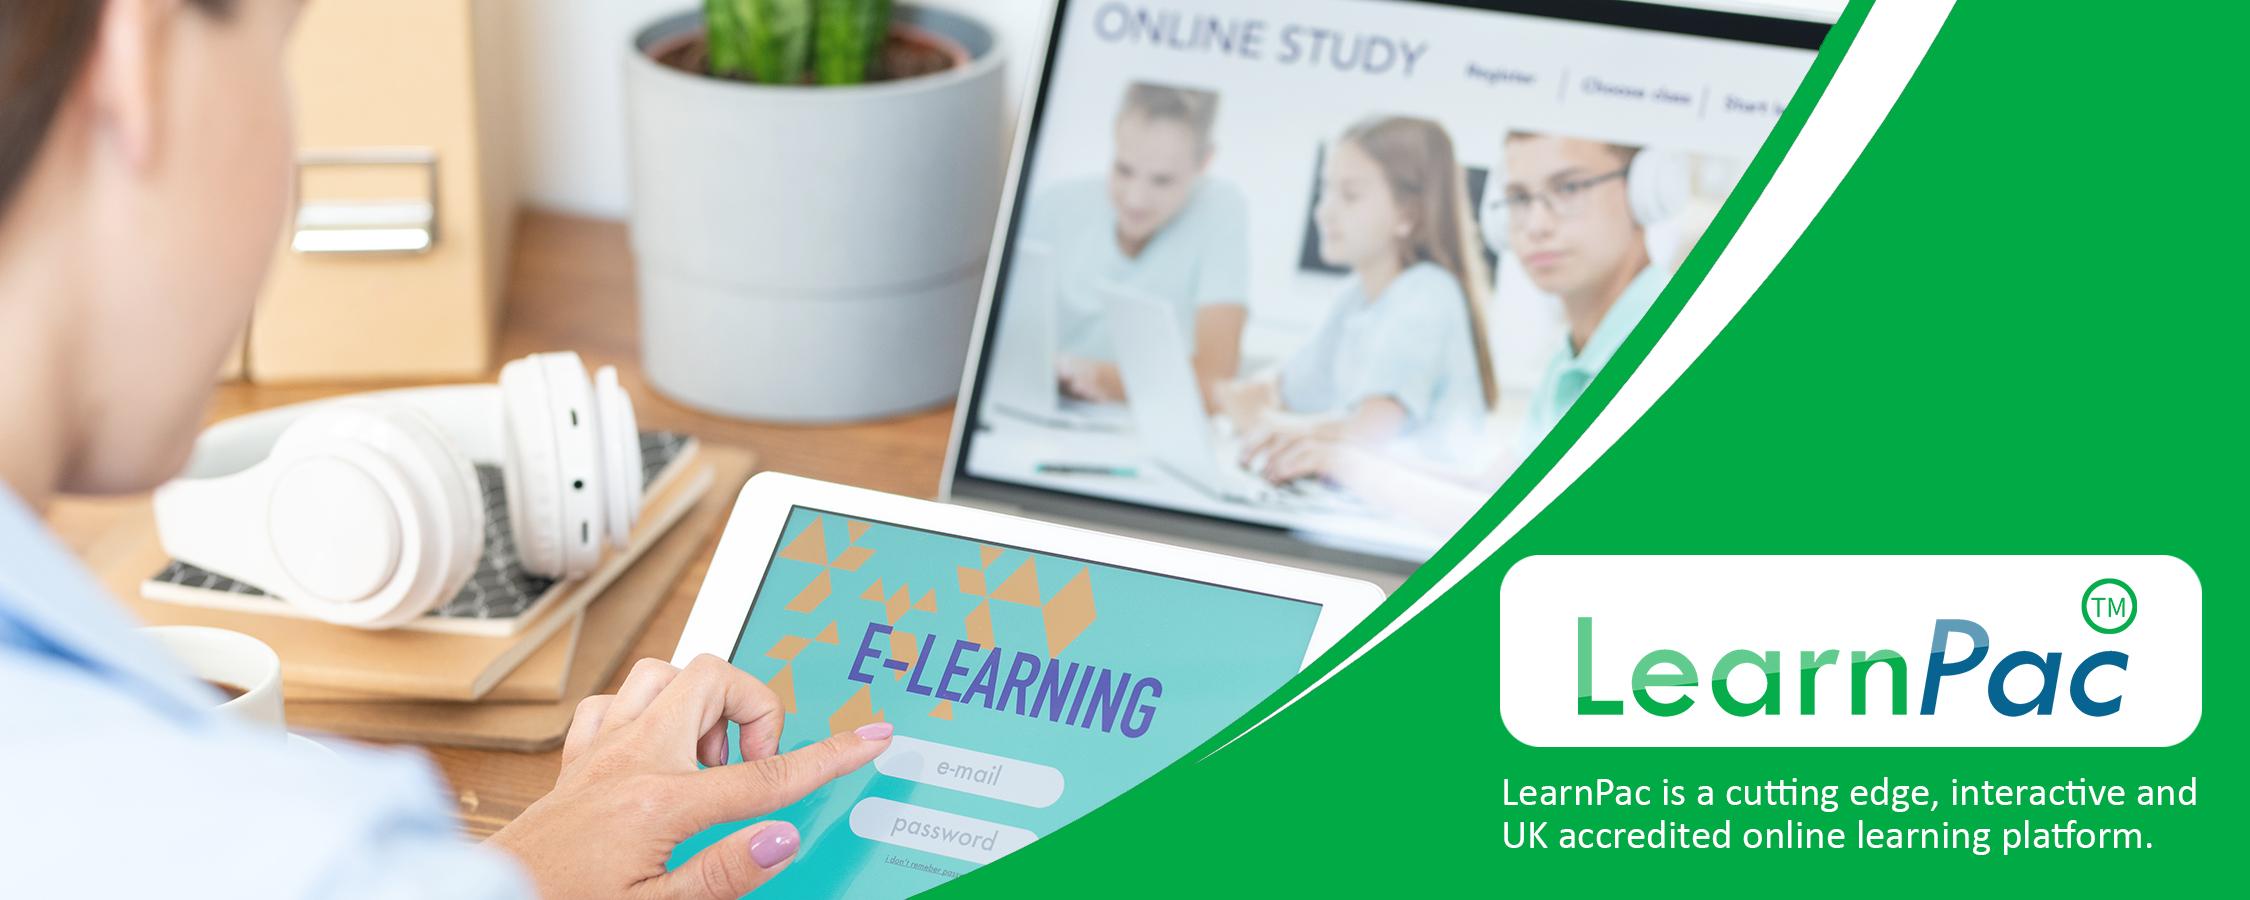 Adult Learning – Physical Skills Training - Online Learning Courses - E-Learning Courses - LearnPac Systems UK -